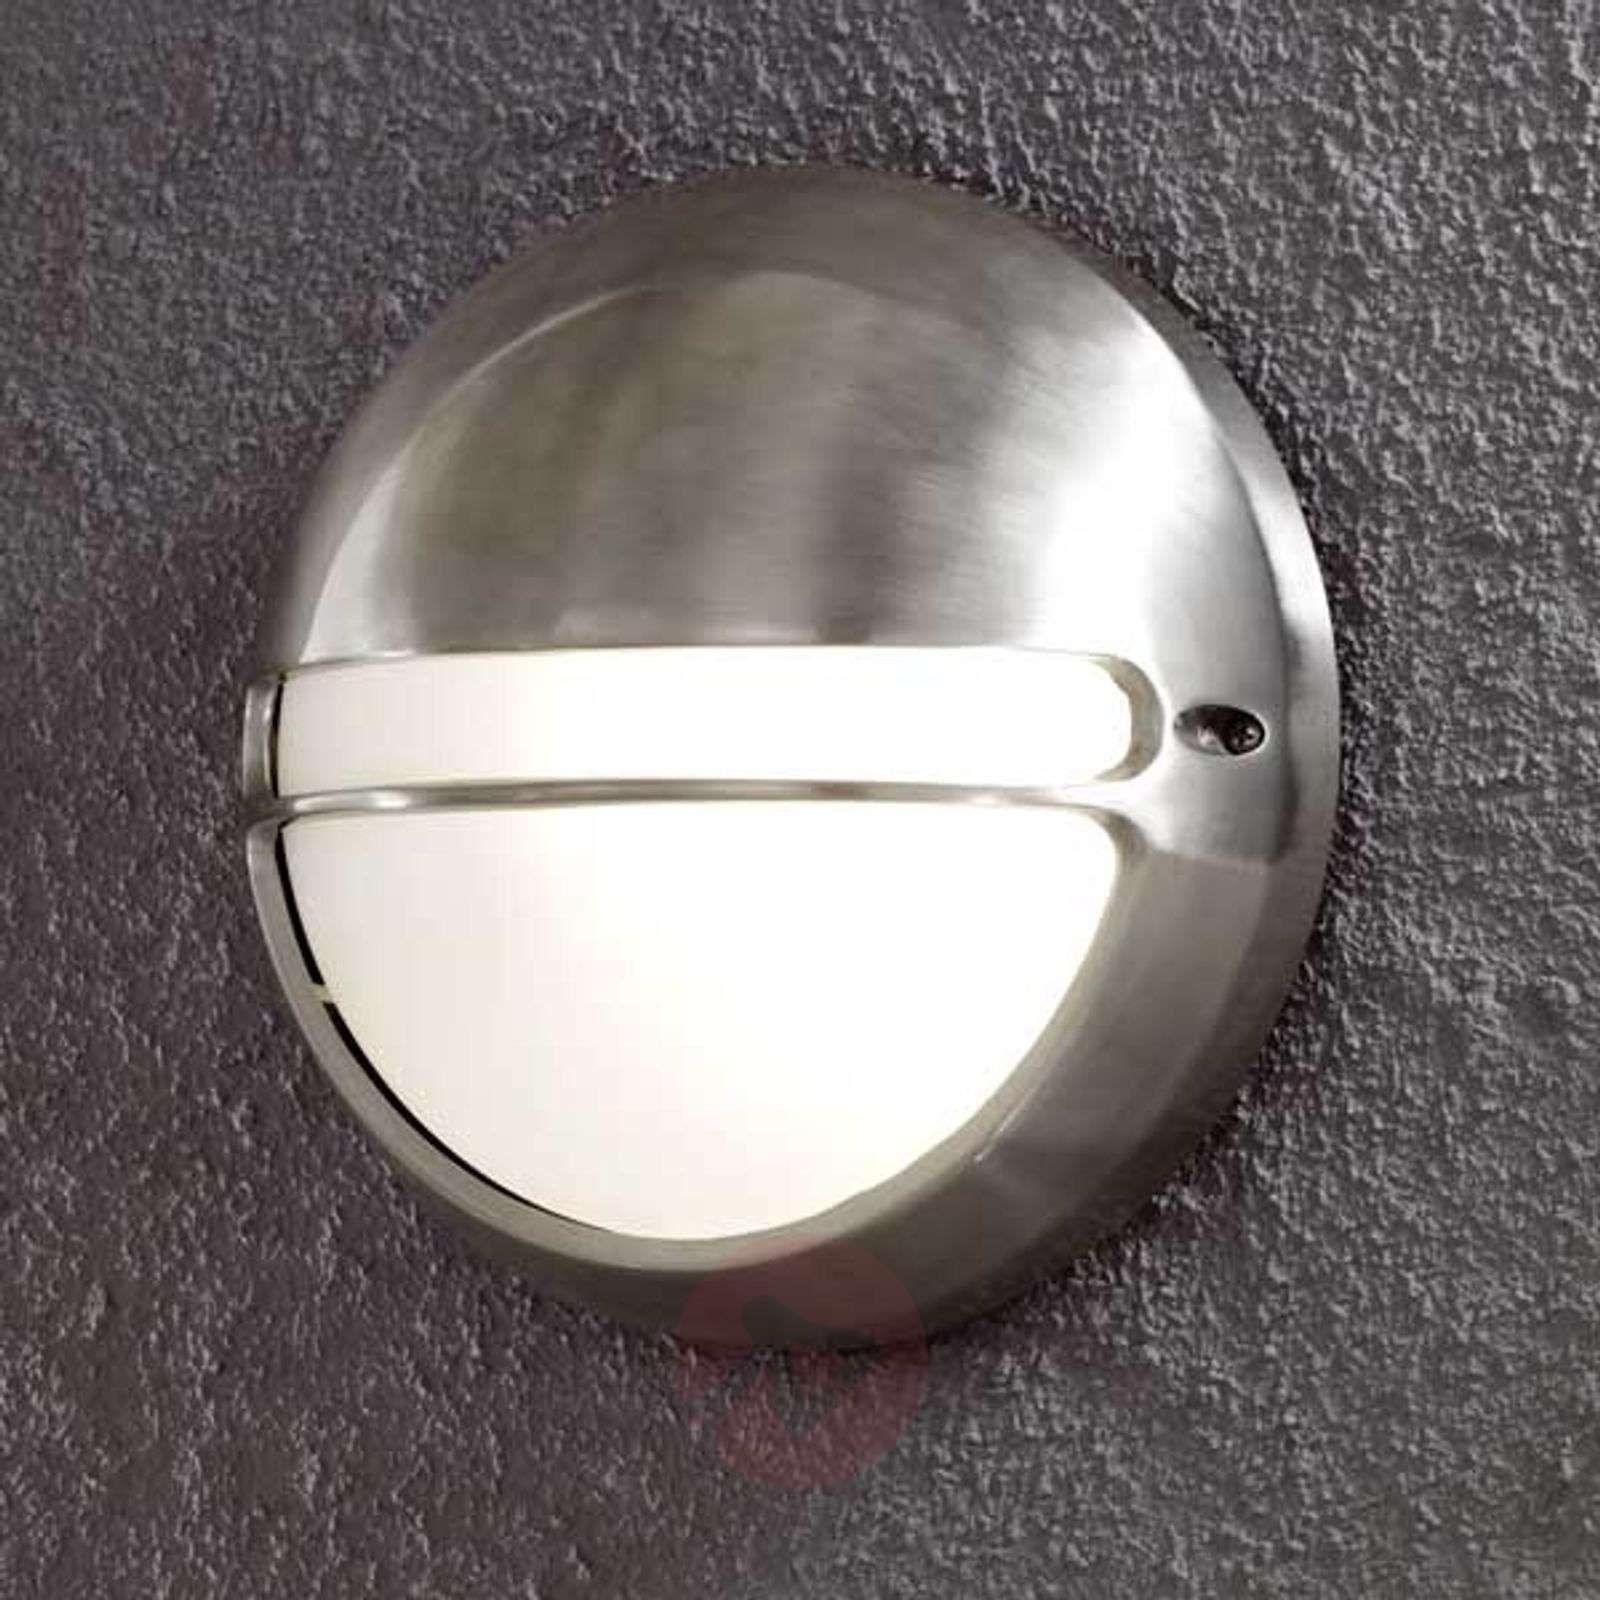 Zewnetrzna Lampa Scienna Torino Okragla Wall Lights Outdoor Wall Lighting Wall Mounted Light